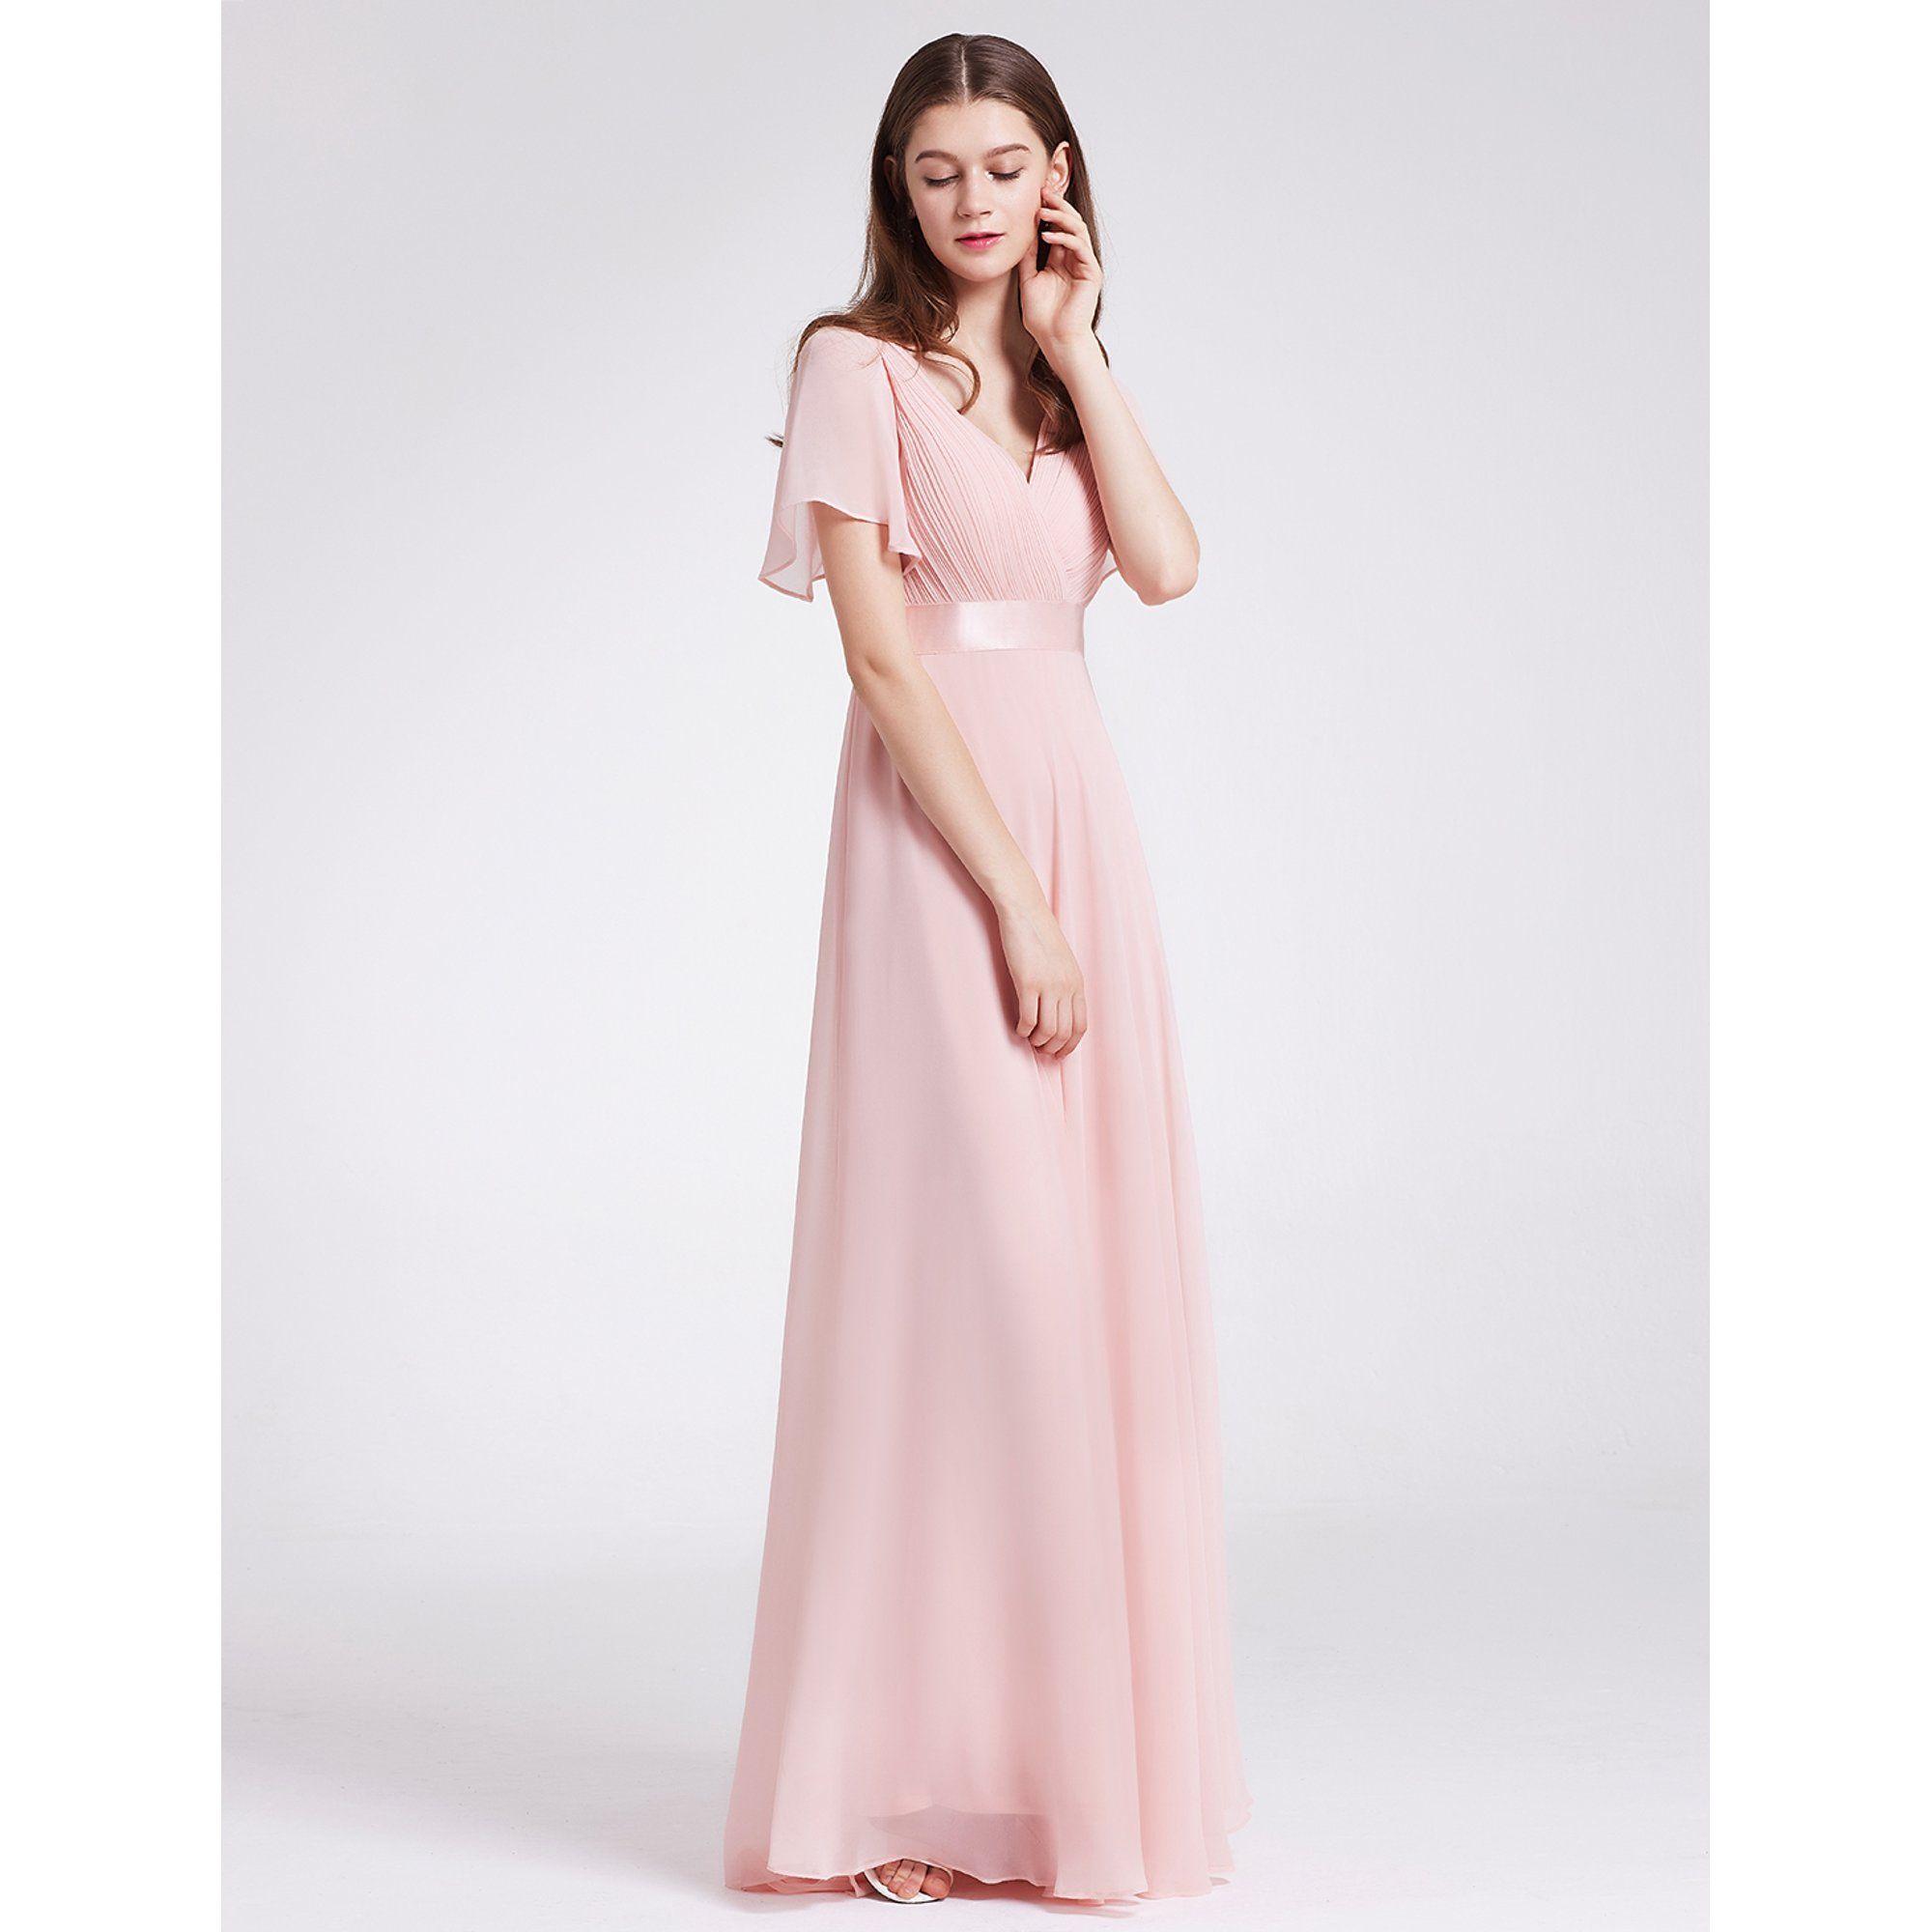 Ever Pretty Ever Pretty Womens Chiffon Long Bridesmaid Dresses For Women 09890 Pink Us8 Walmart Com In 2021 Bridesmaid Dresses Long Chiffon Pink Wedding Guest Dresses Pink Long Dress [ 2000 x 2000 Pixel ]